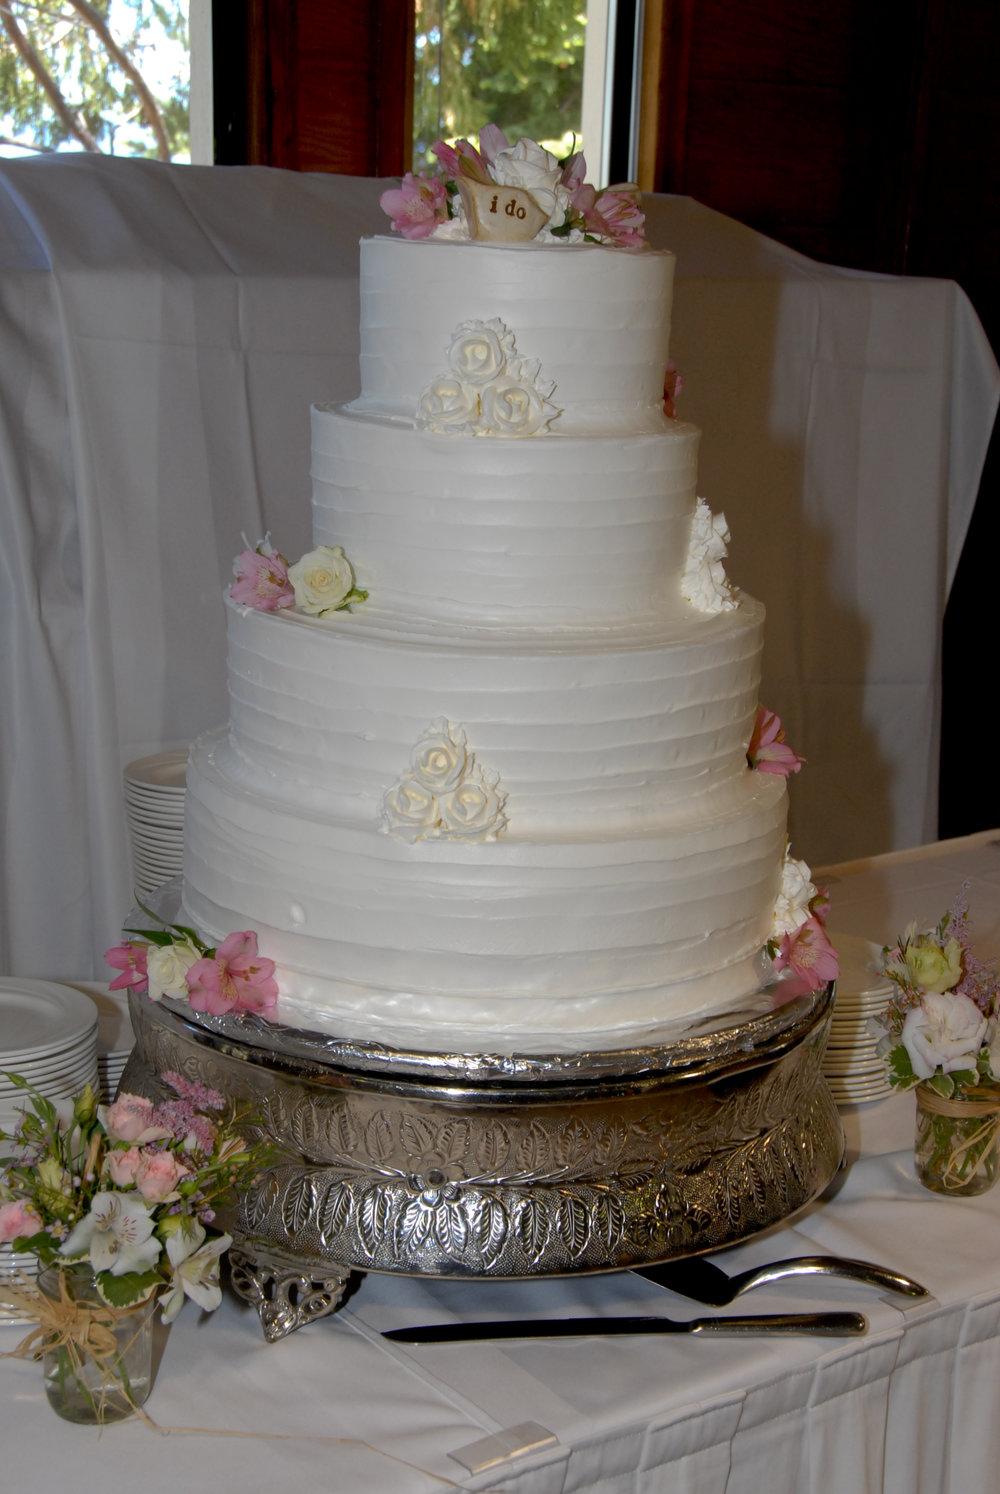 02 Cake.jpg